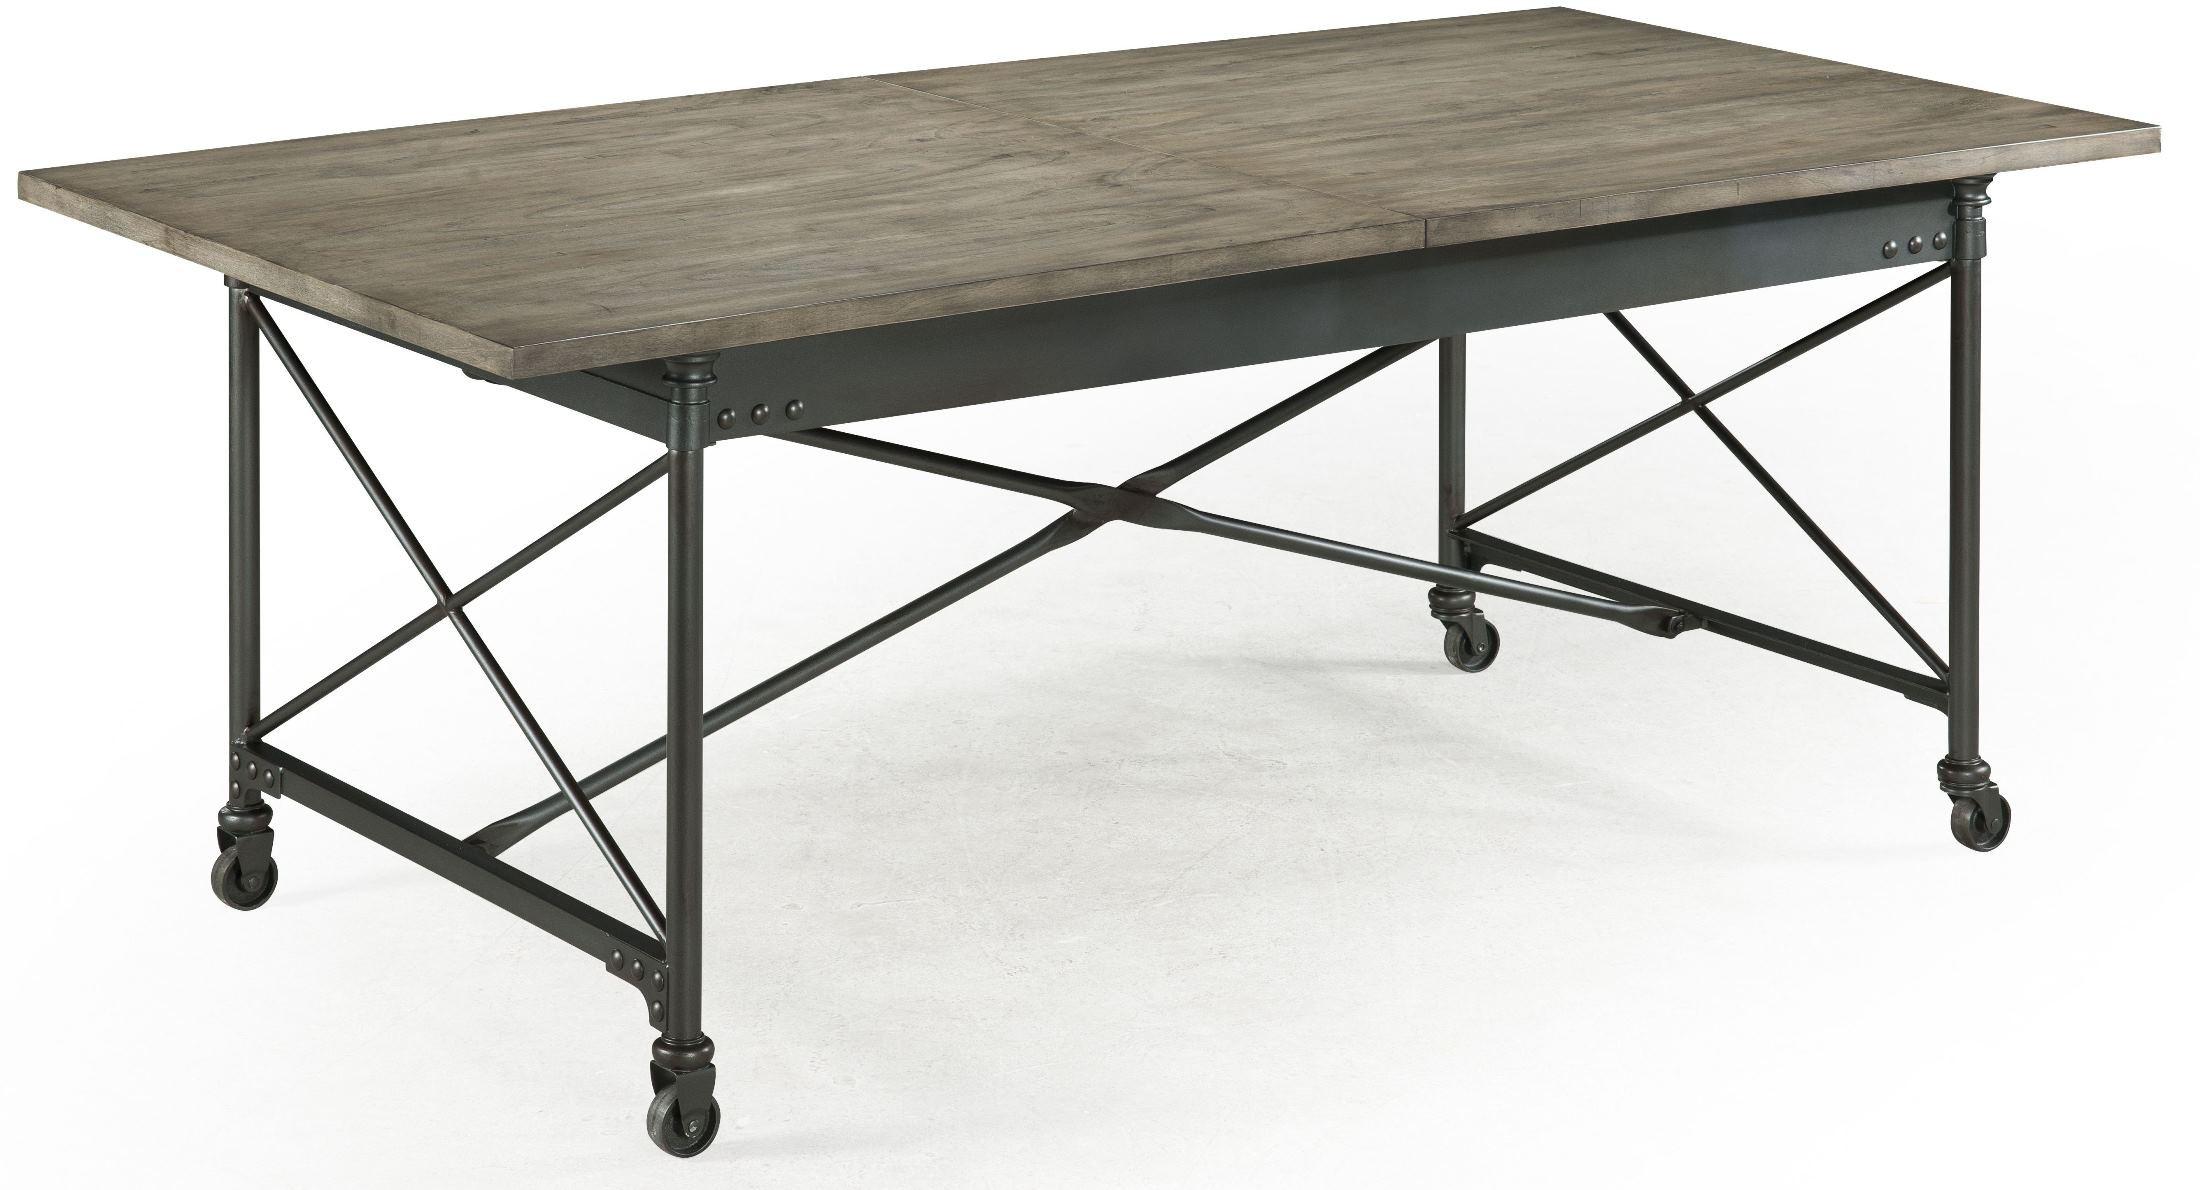 Walton rectangular dining room set from magnussen home d2469 20 coleman furniture - Rectangular dining table for 6 ...